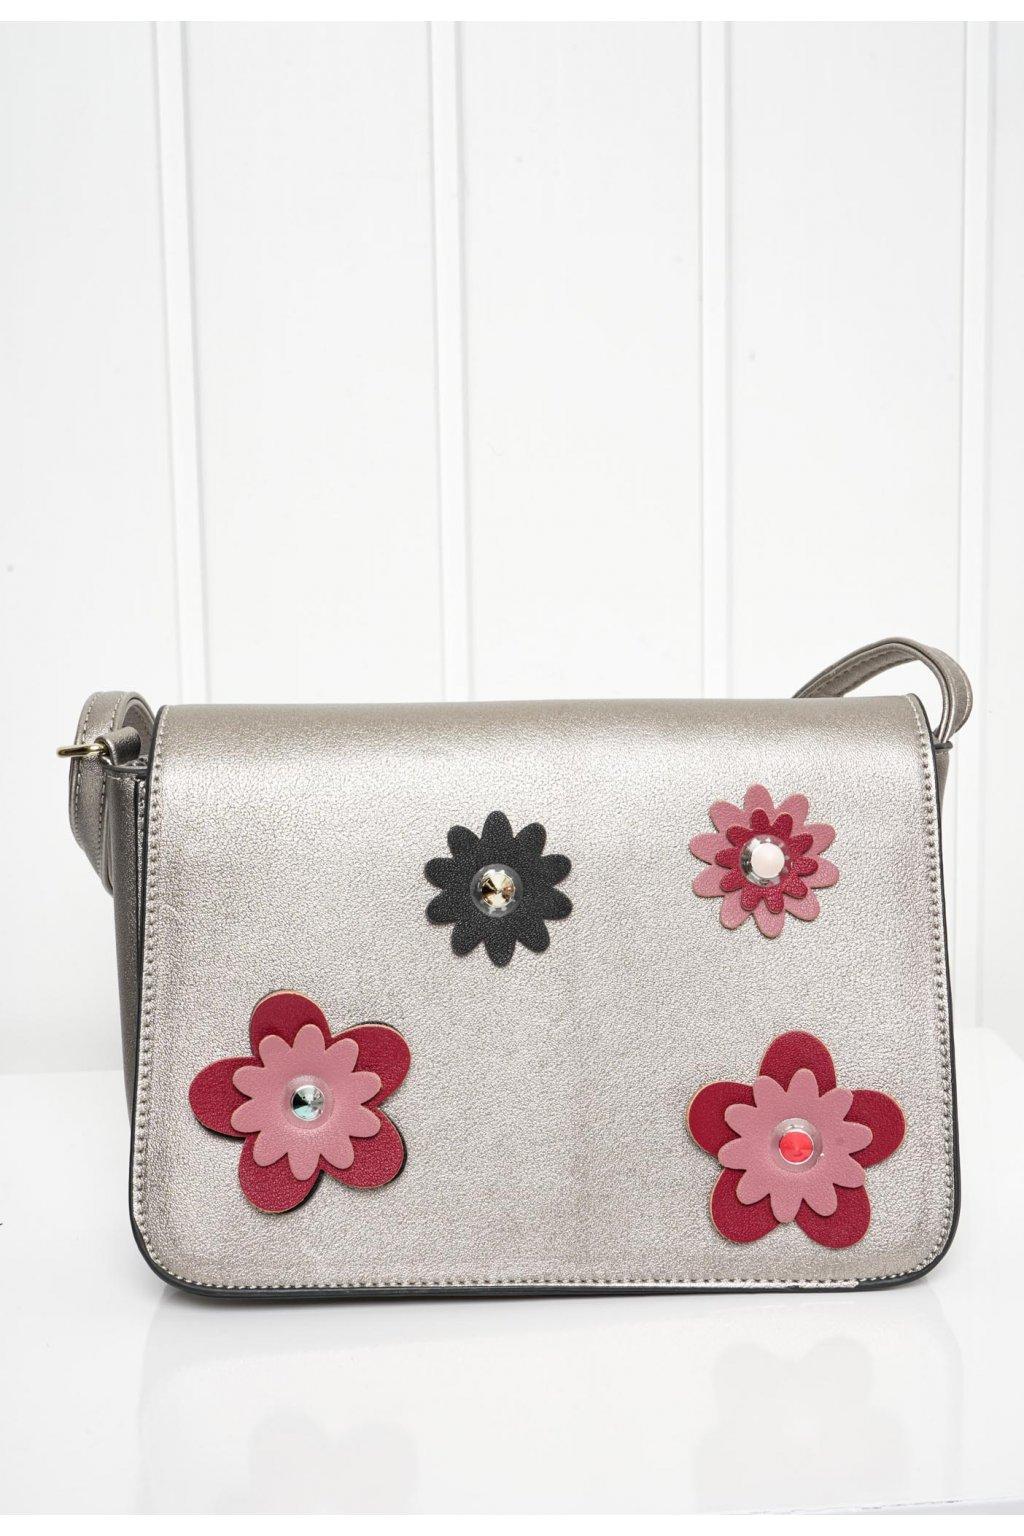 Kabelka, crossbody, ruksak, shopping bag, shopperka, 615